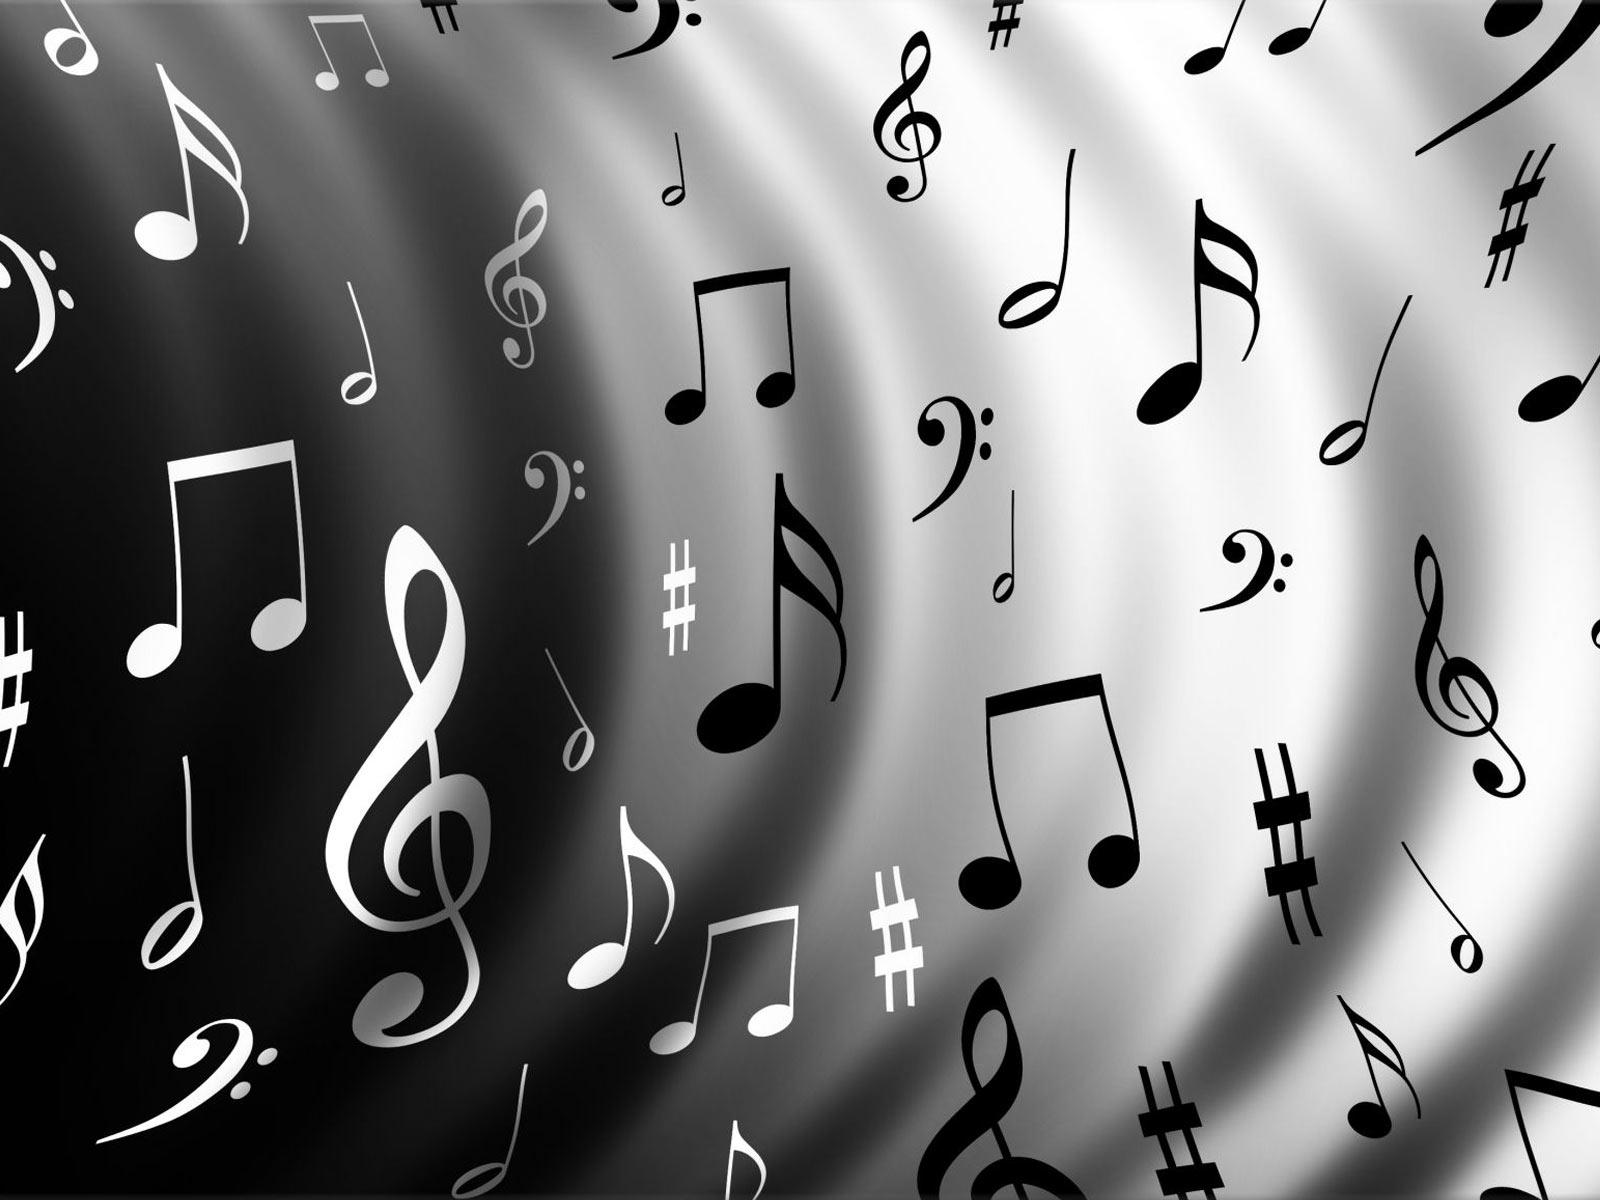 music notes HD wallpaper Wallpaper